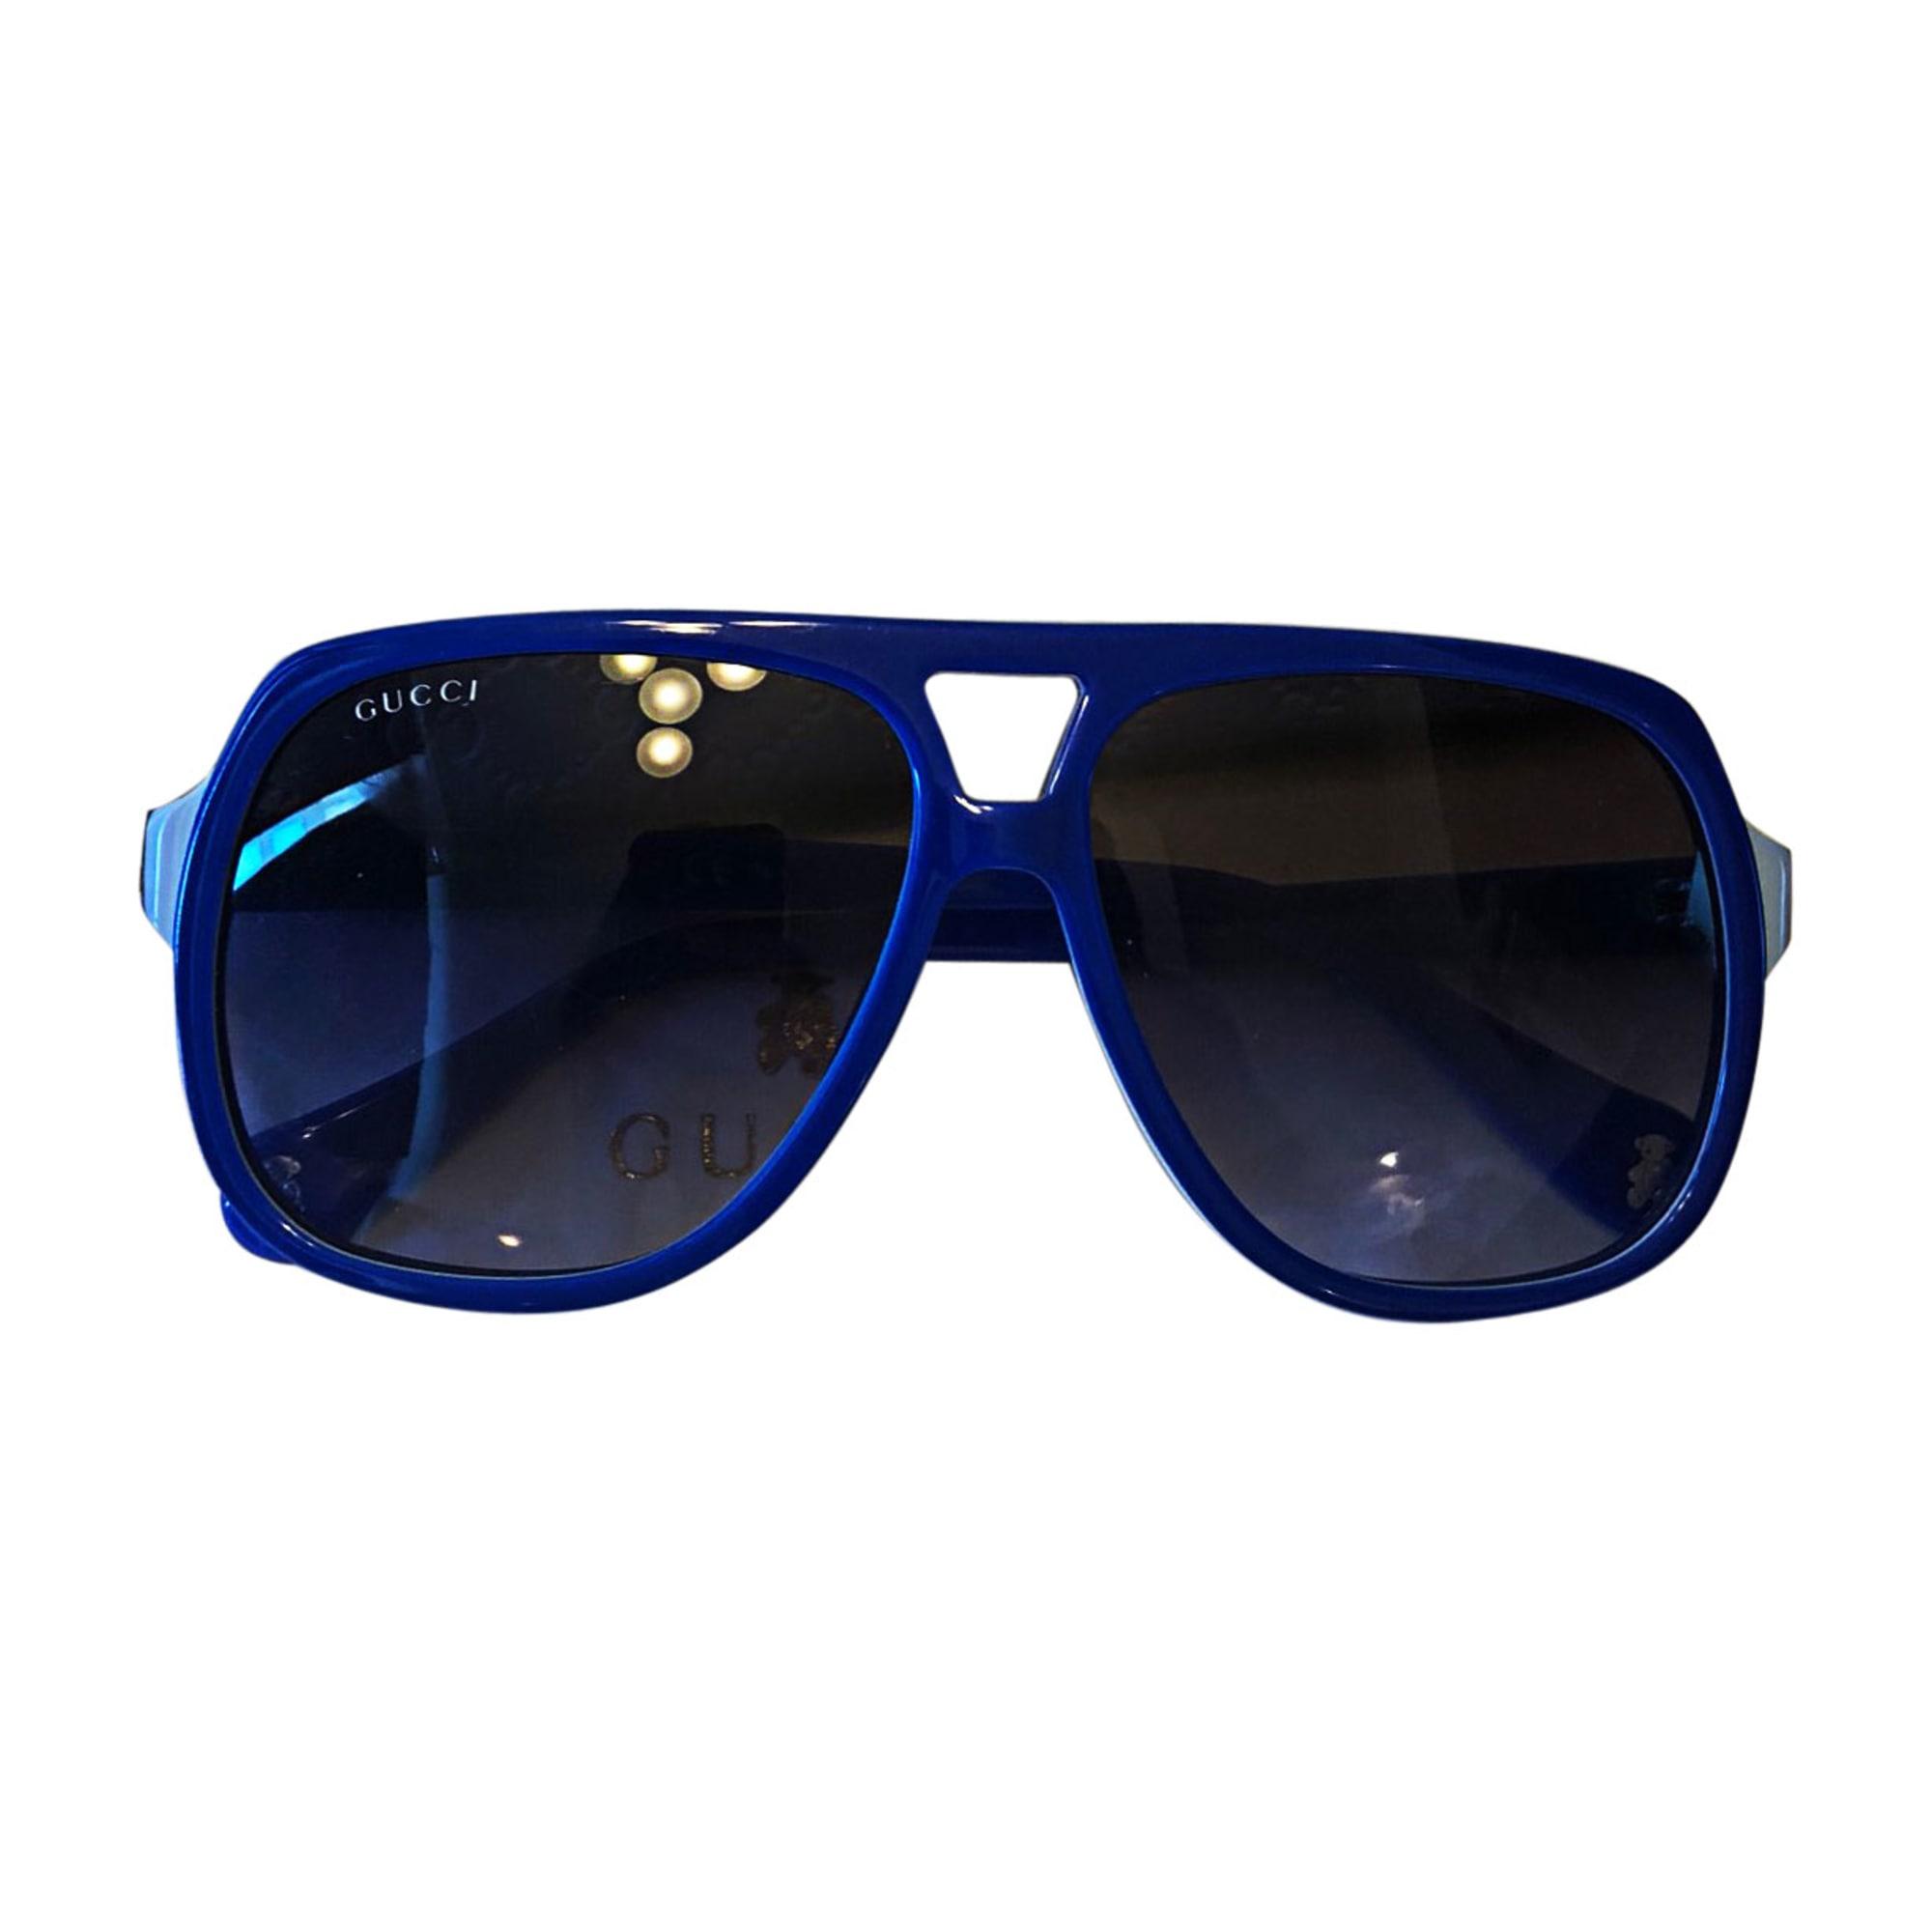 Lunettes de soleil GUCCI Bleu, bleu marine, bleu turquoise